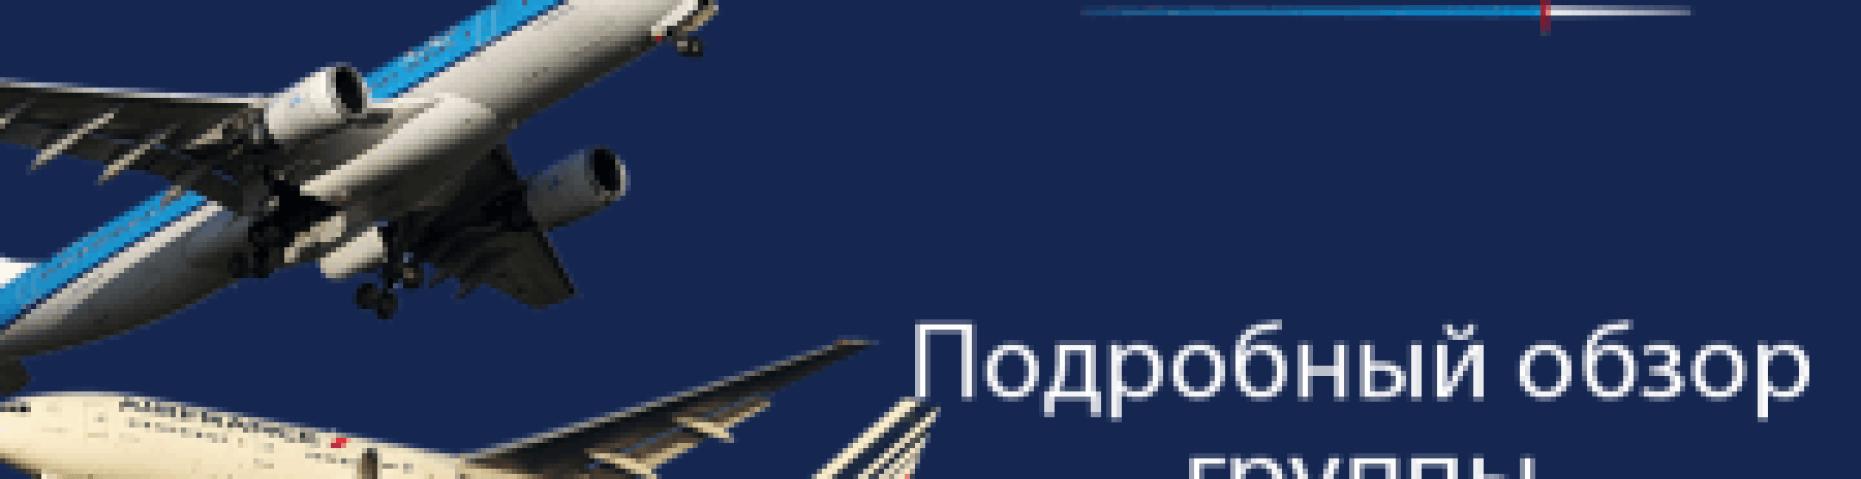 Air France KLM: заглавное фото